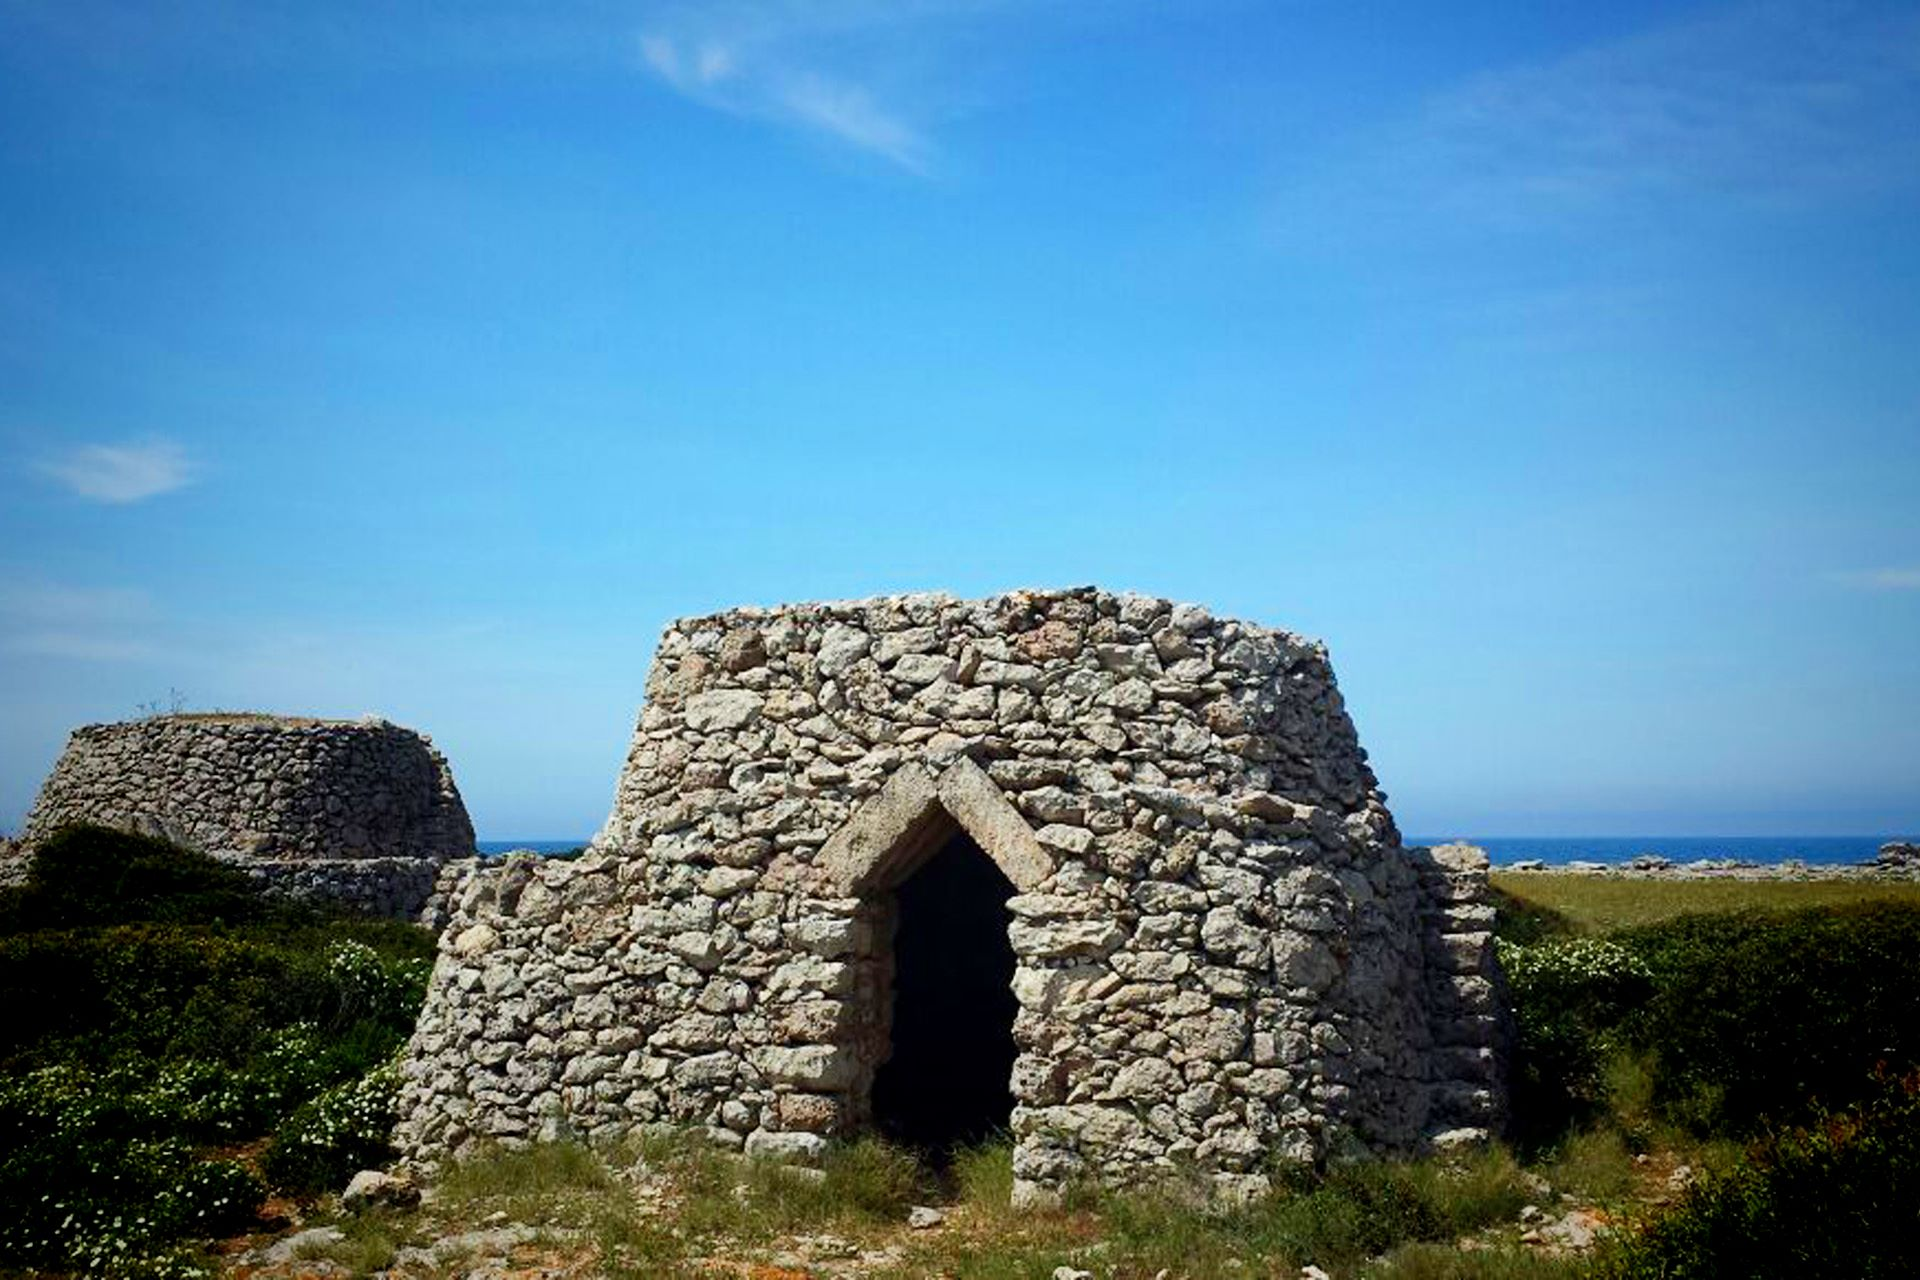 apulia-slow-travel-lecce-otranto-pagliara-salento-countryside-stone houses-steinhuetten